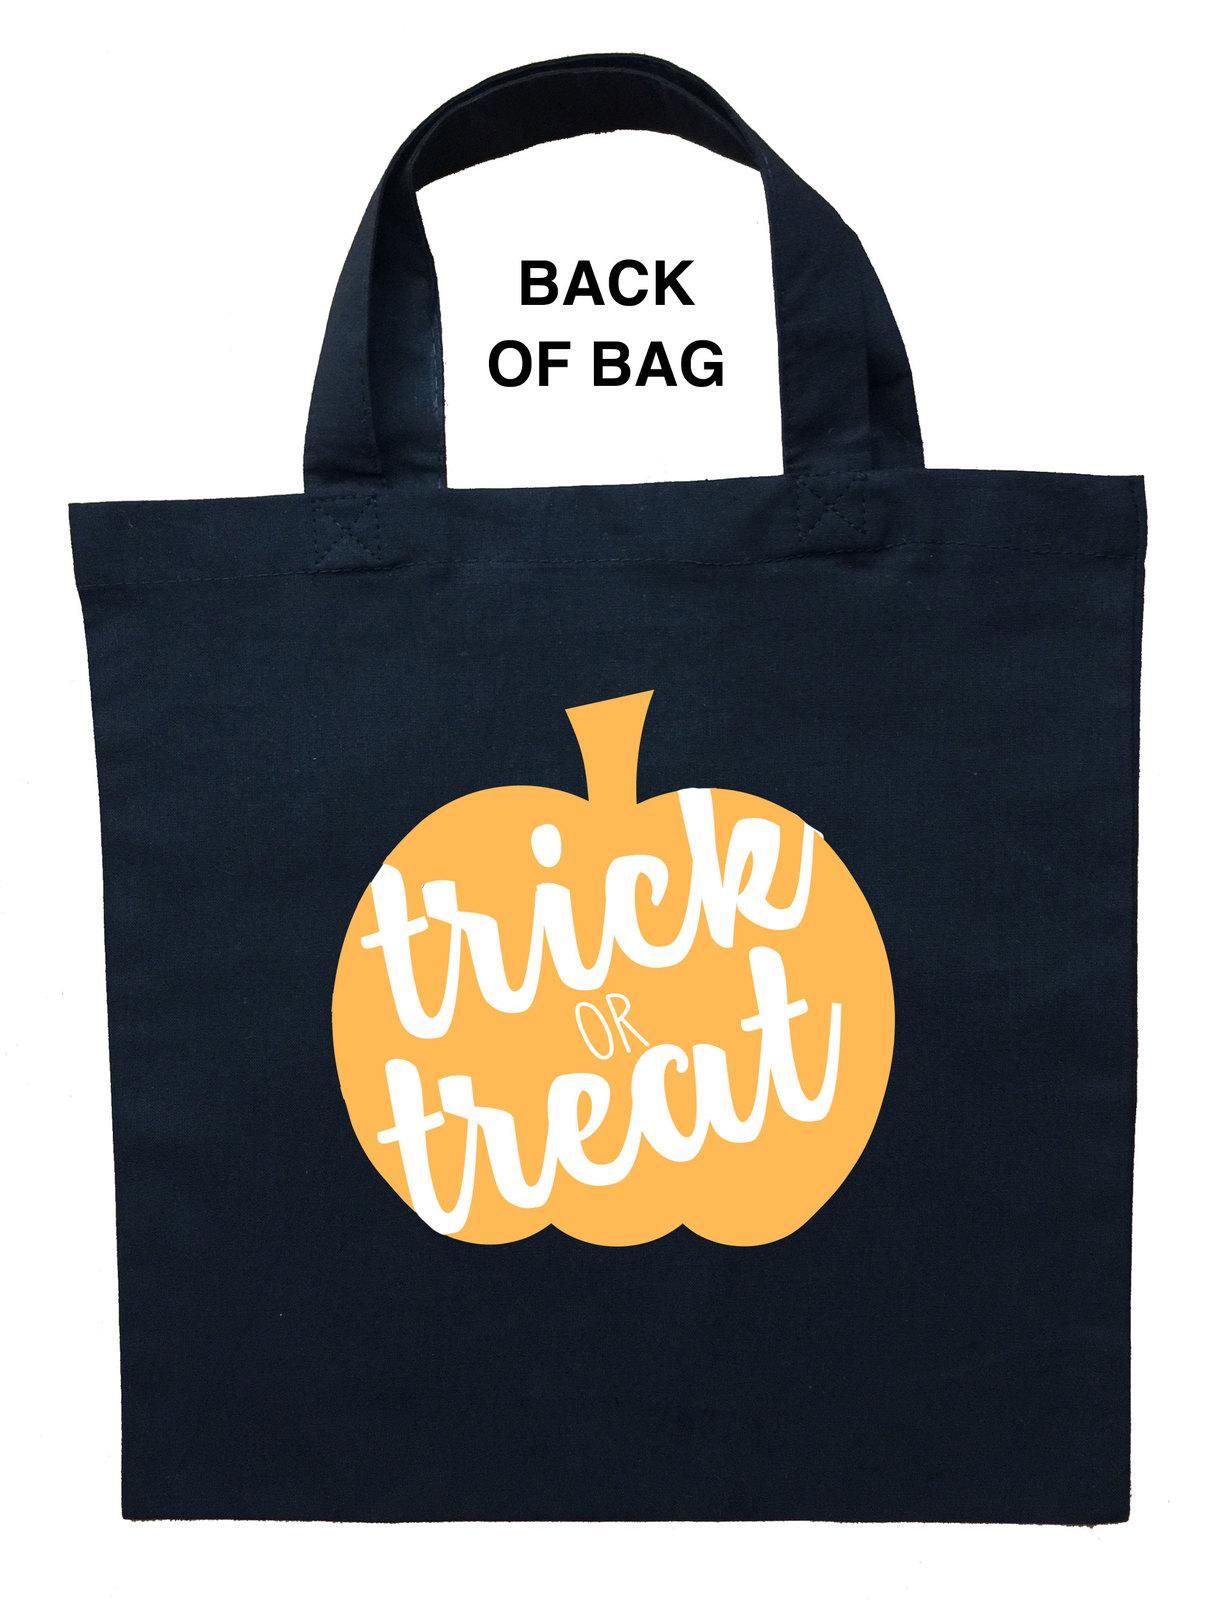 Giraffe Trick or Treat Bag, Giraffe Halloween Bag, Giraffe Loot Bag, Giraffe Bag